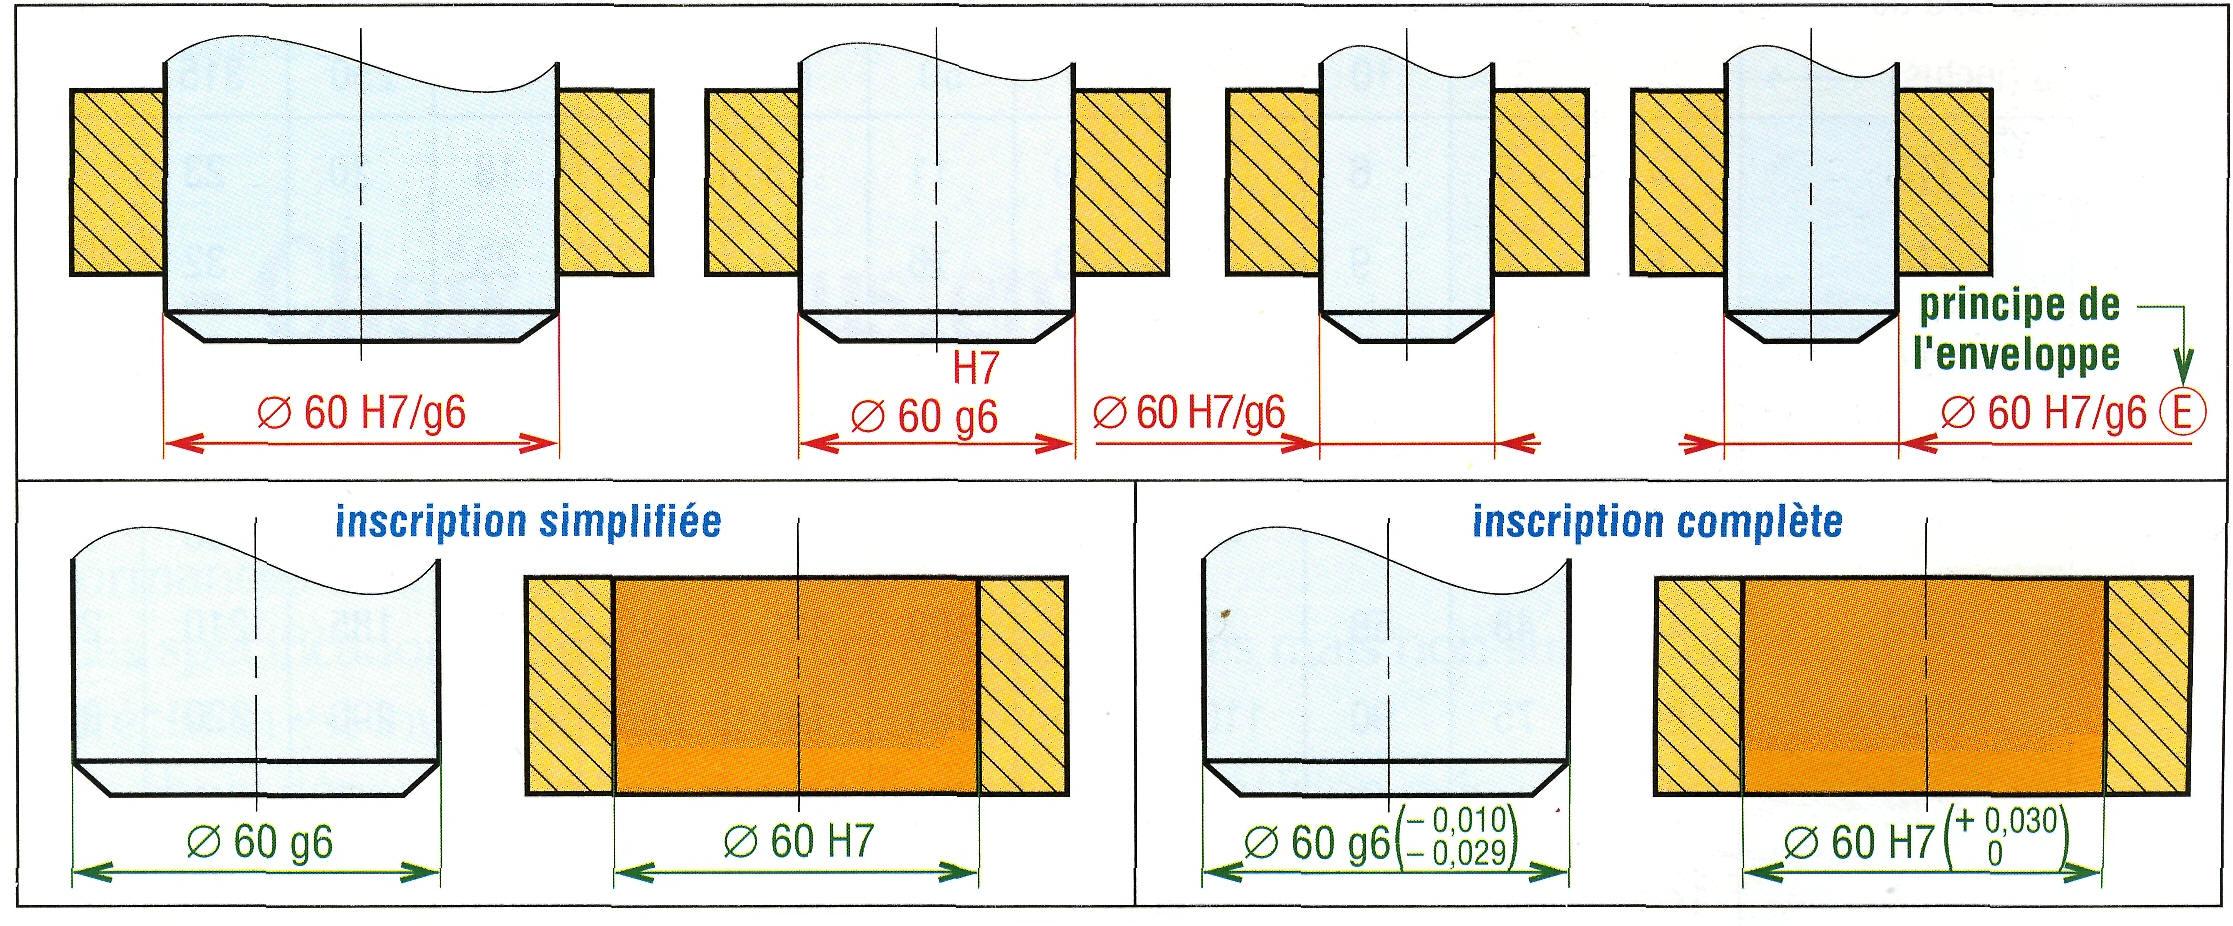 Tolérance h7 dessin industriel